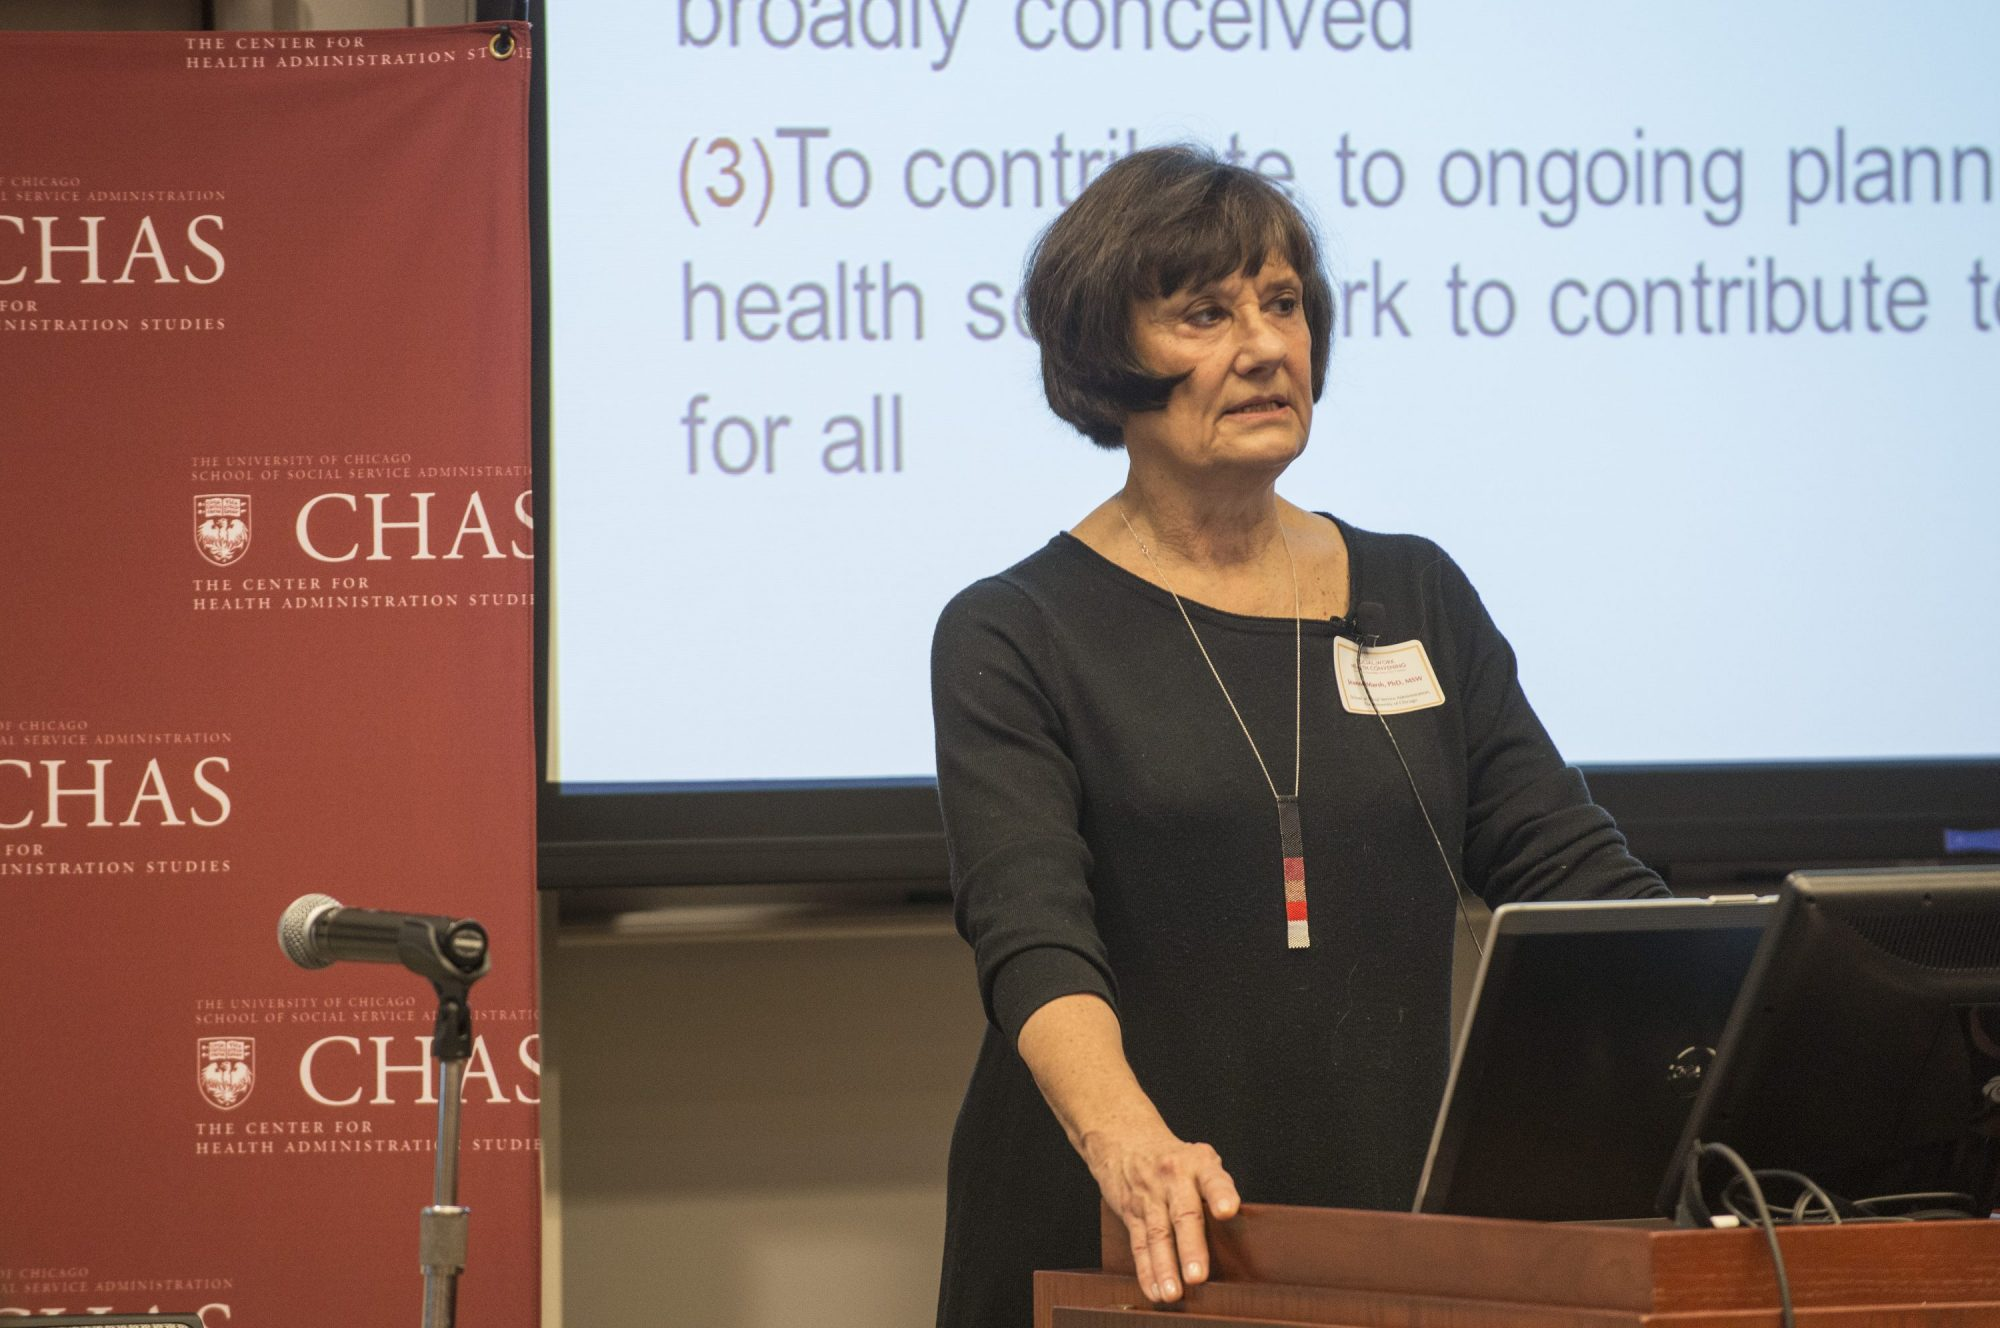 2017 Social Work & Health Convening